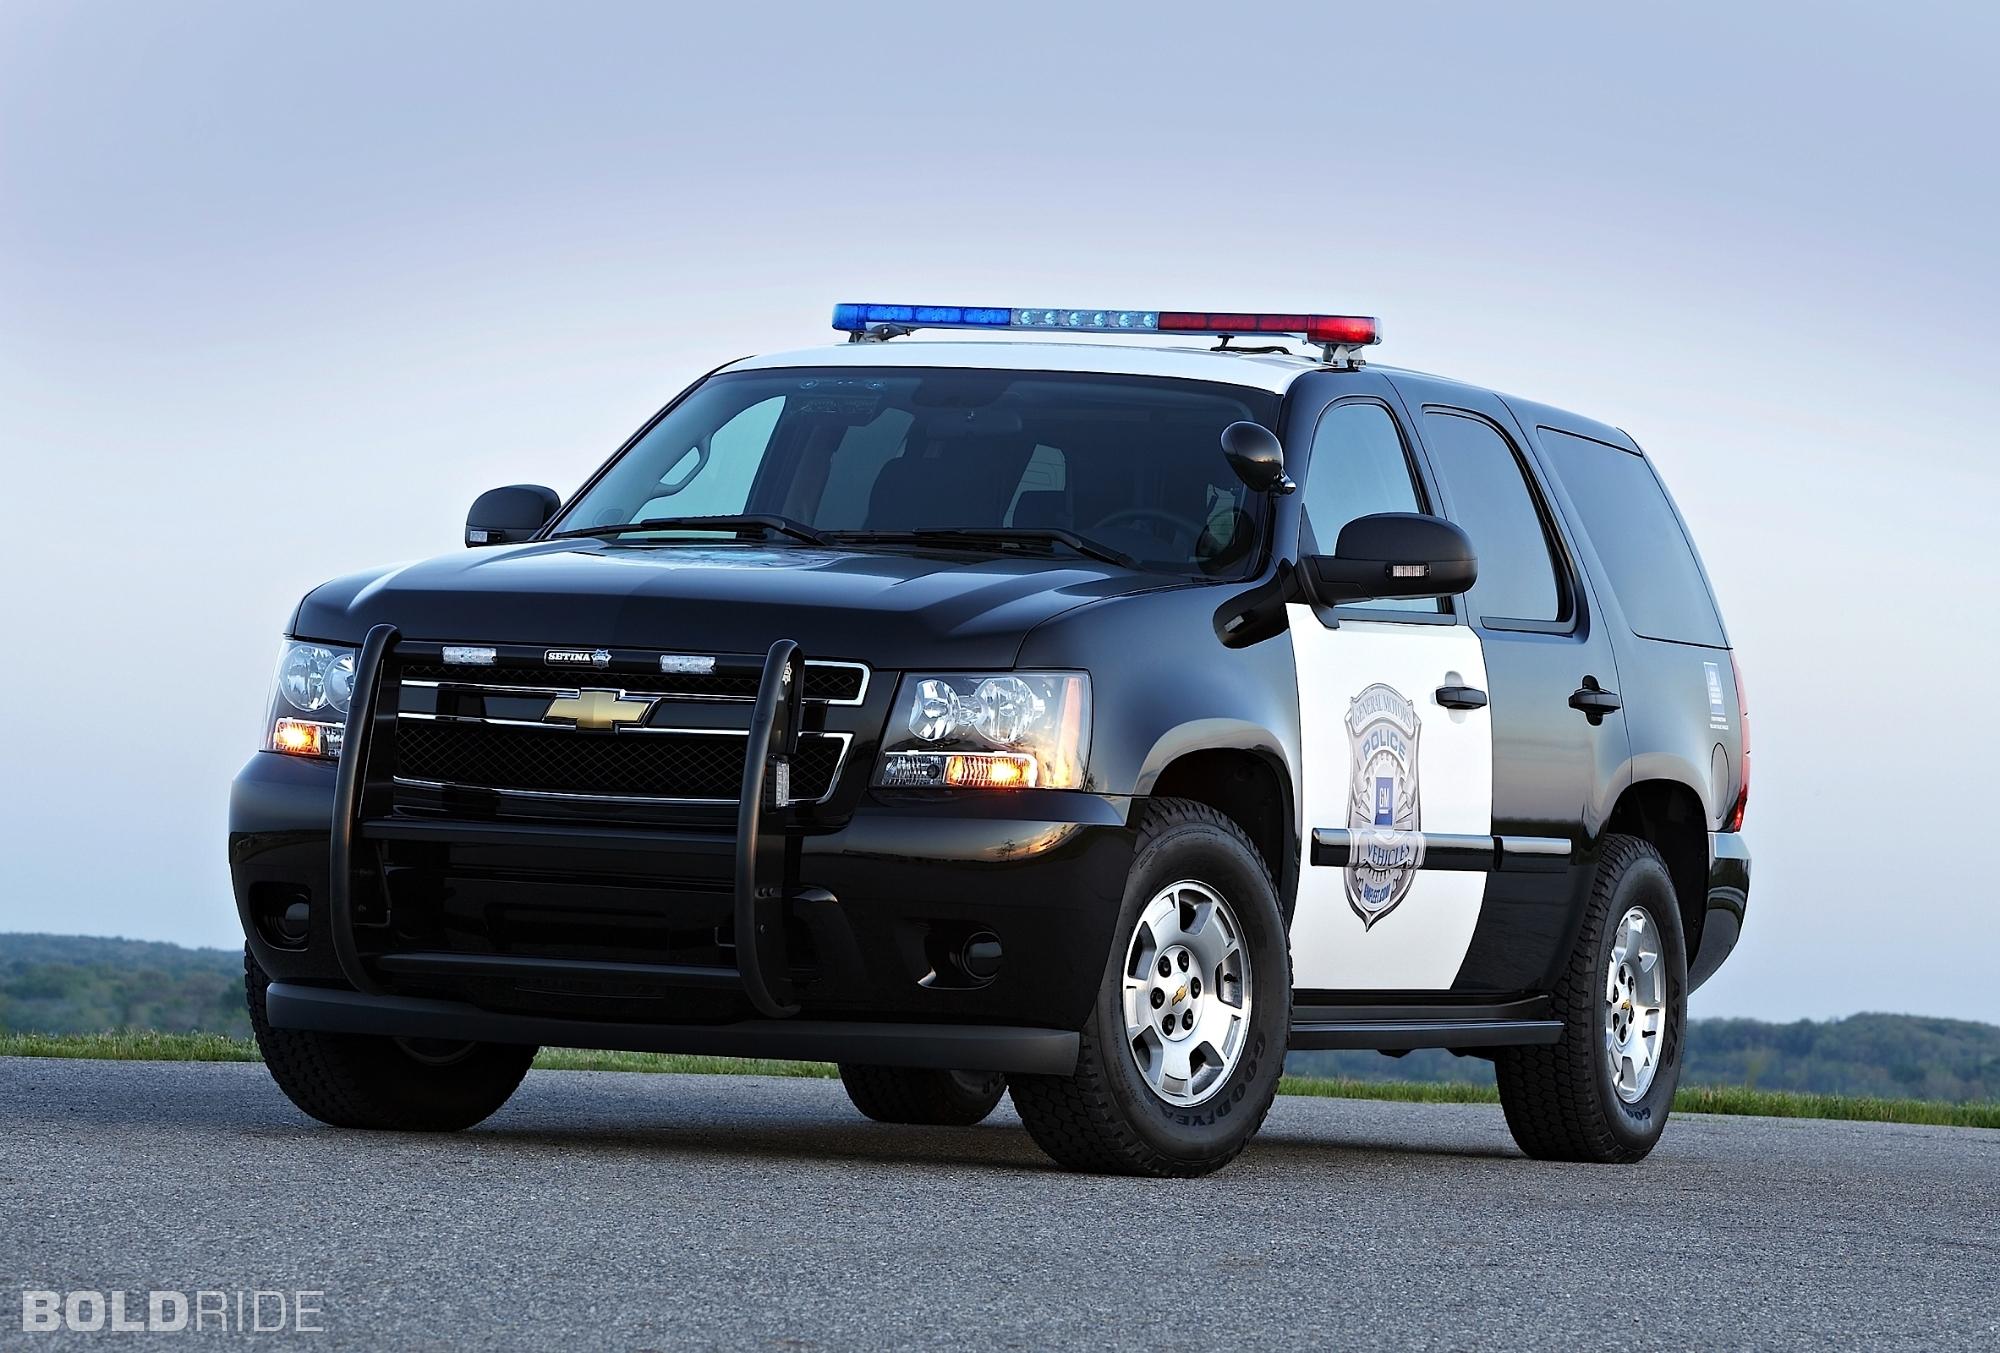 2011 chevrolet tahoe police suv 4x4 g wallpaper 2000x1353 110562 wallpaperup. Black Bedroom Furniture Sets. Home Design Ideas